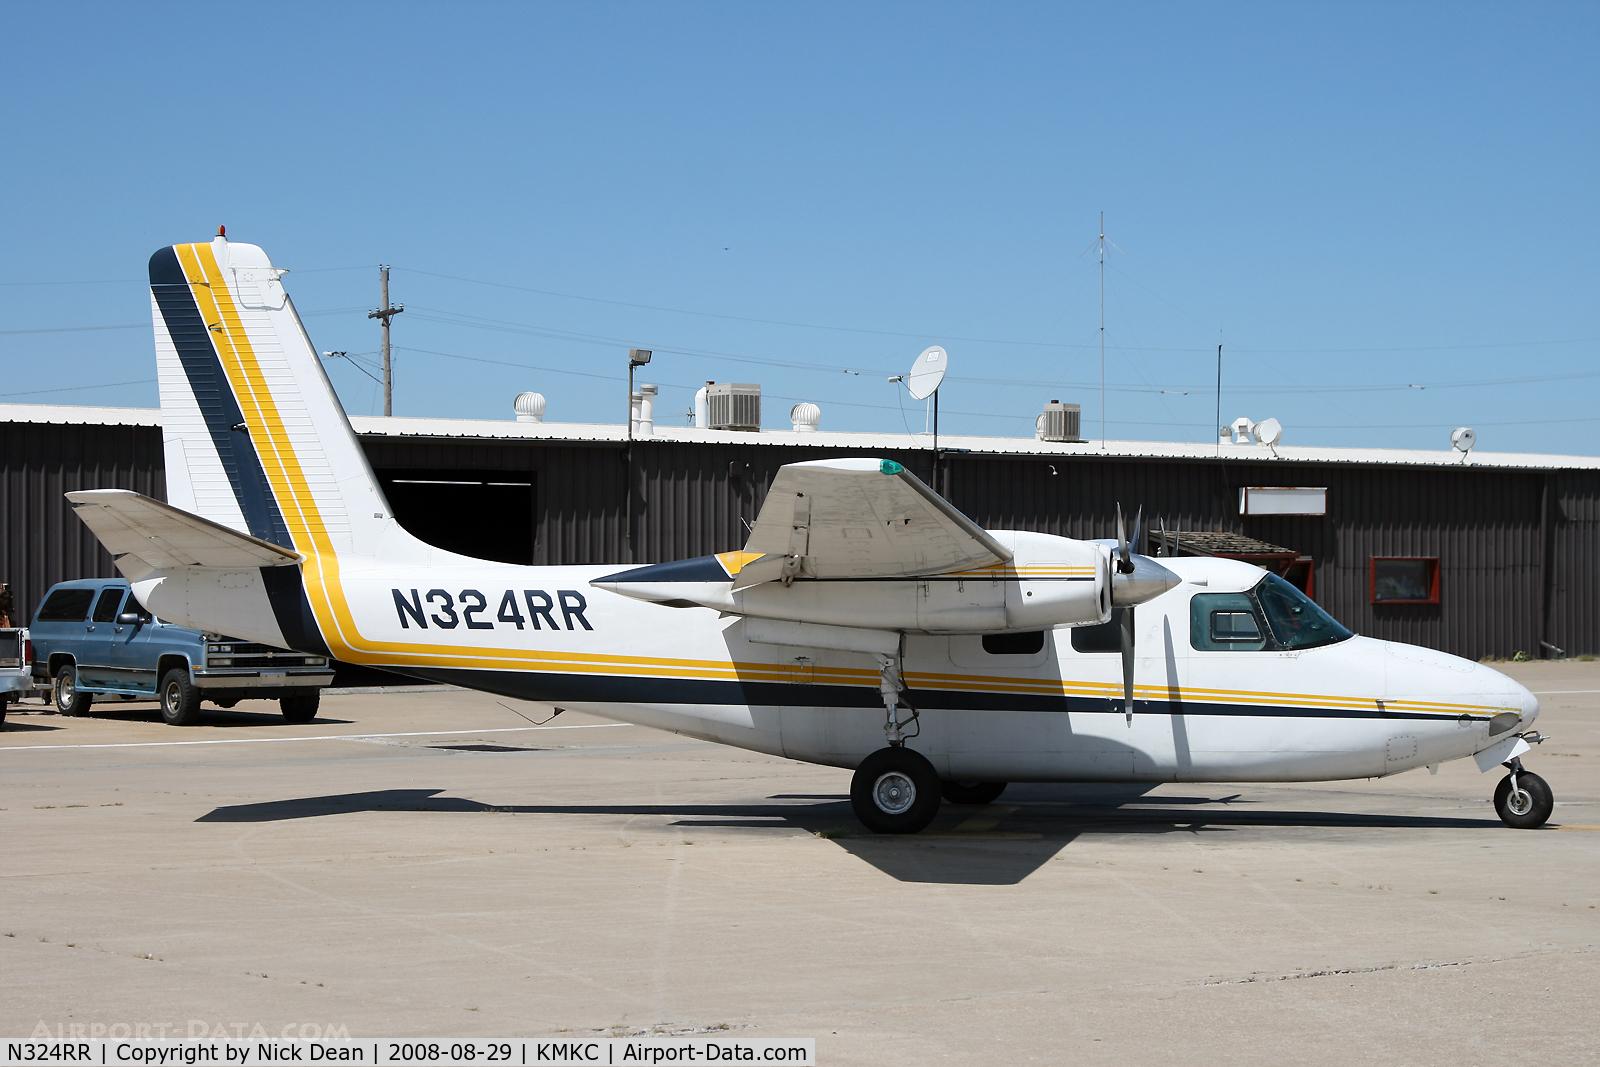 N324RR, 1964 Aero Commander 500-B C/N 1386-139, /